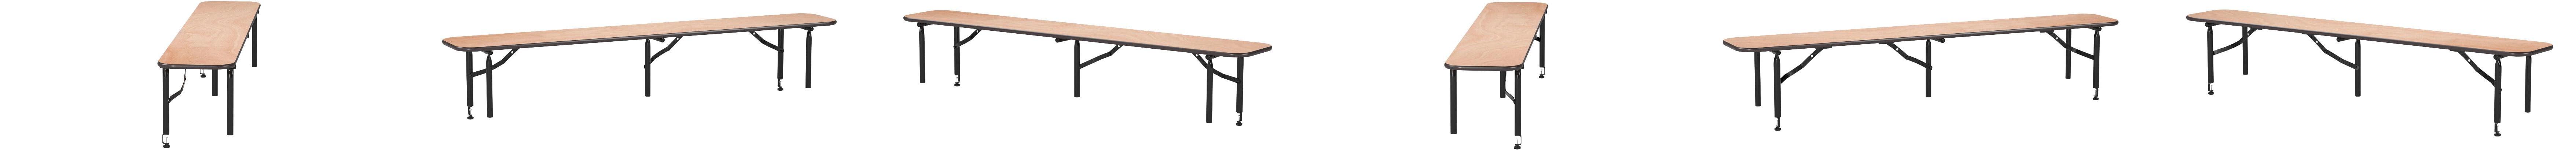 Amazon Com Flash Furniture 72 X 12 X 12 Bar Top Riser With Black Legs Furniture Decor